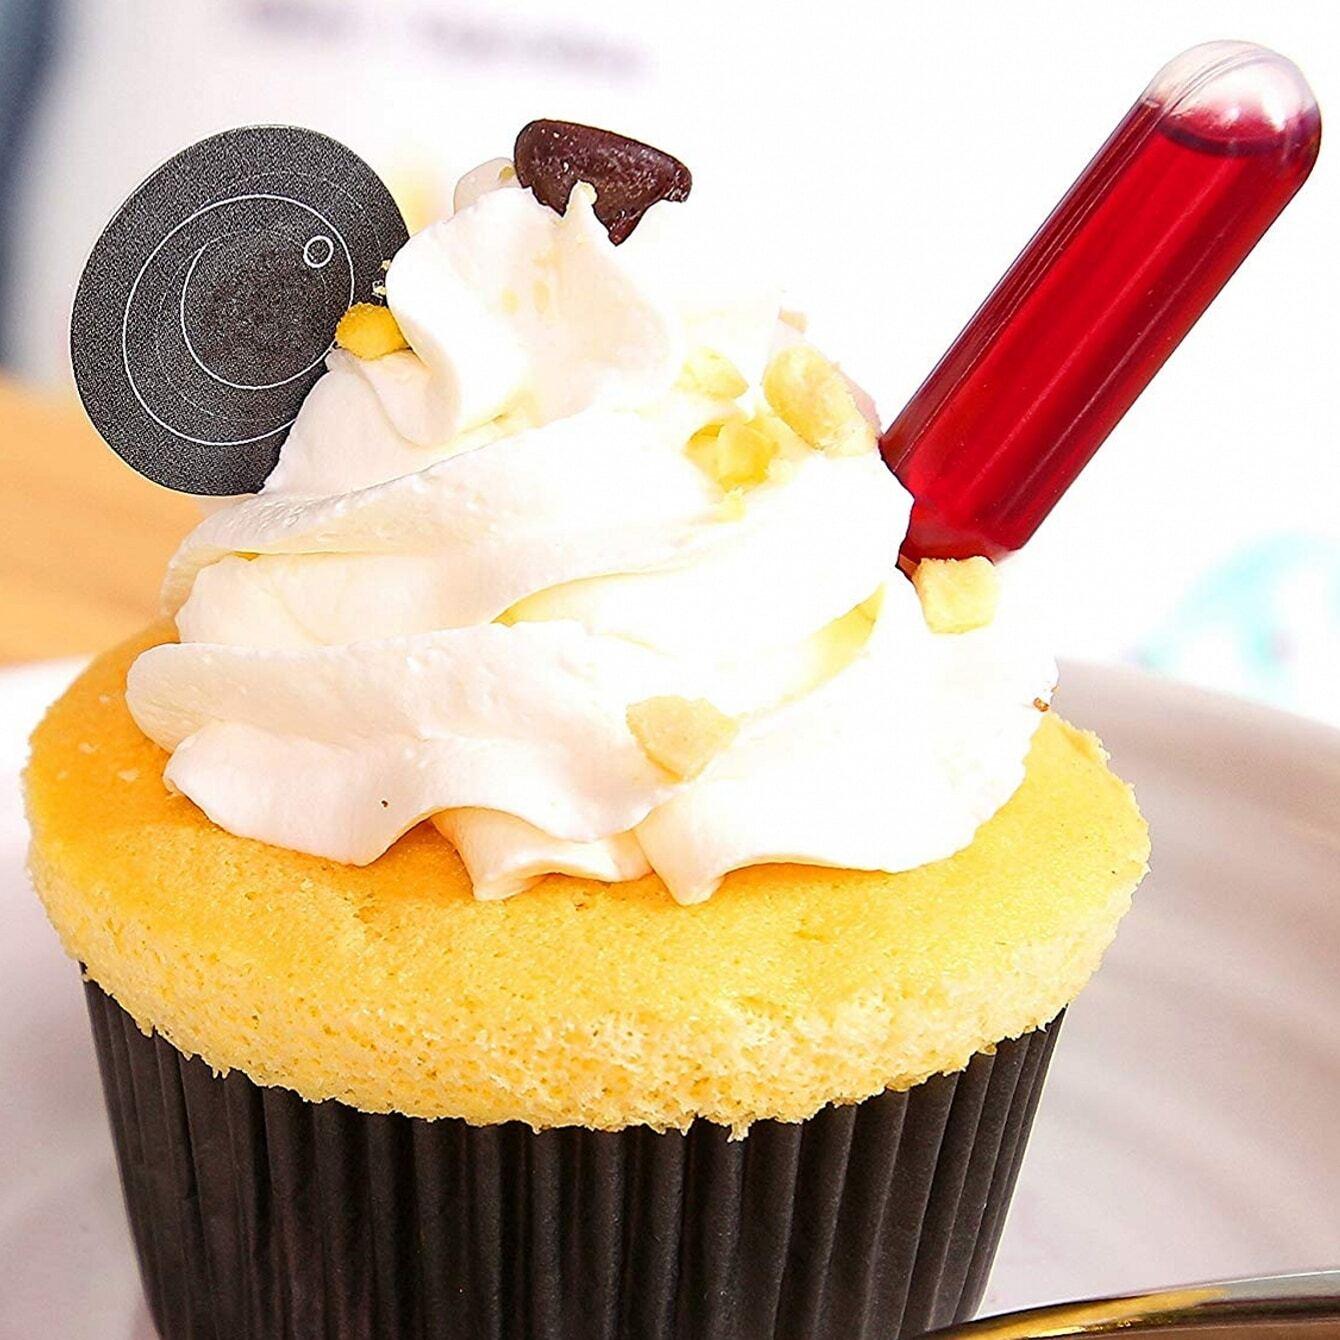 Cupcake Jam Squeeze Sauce Dropper 30st